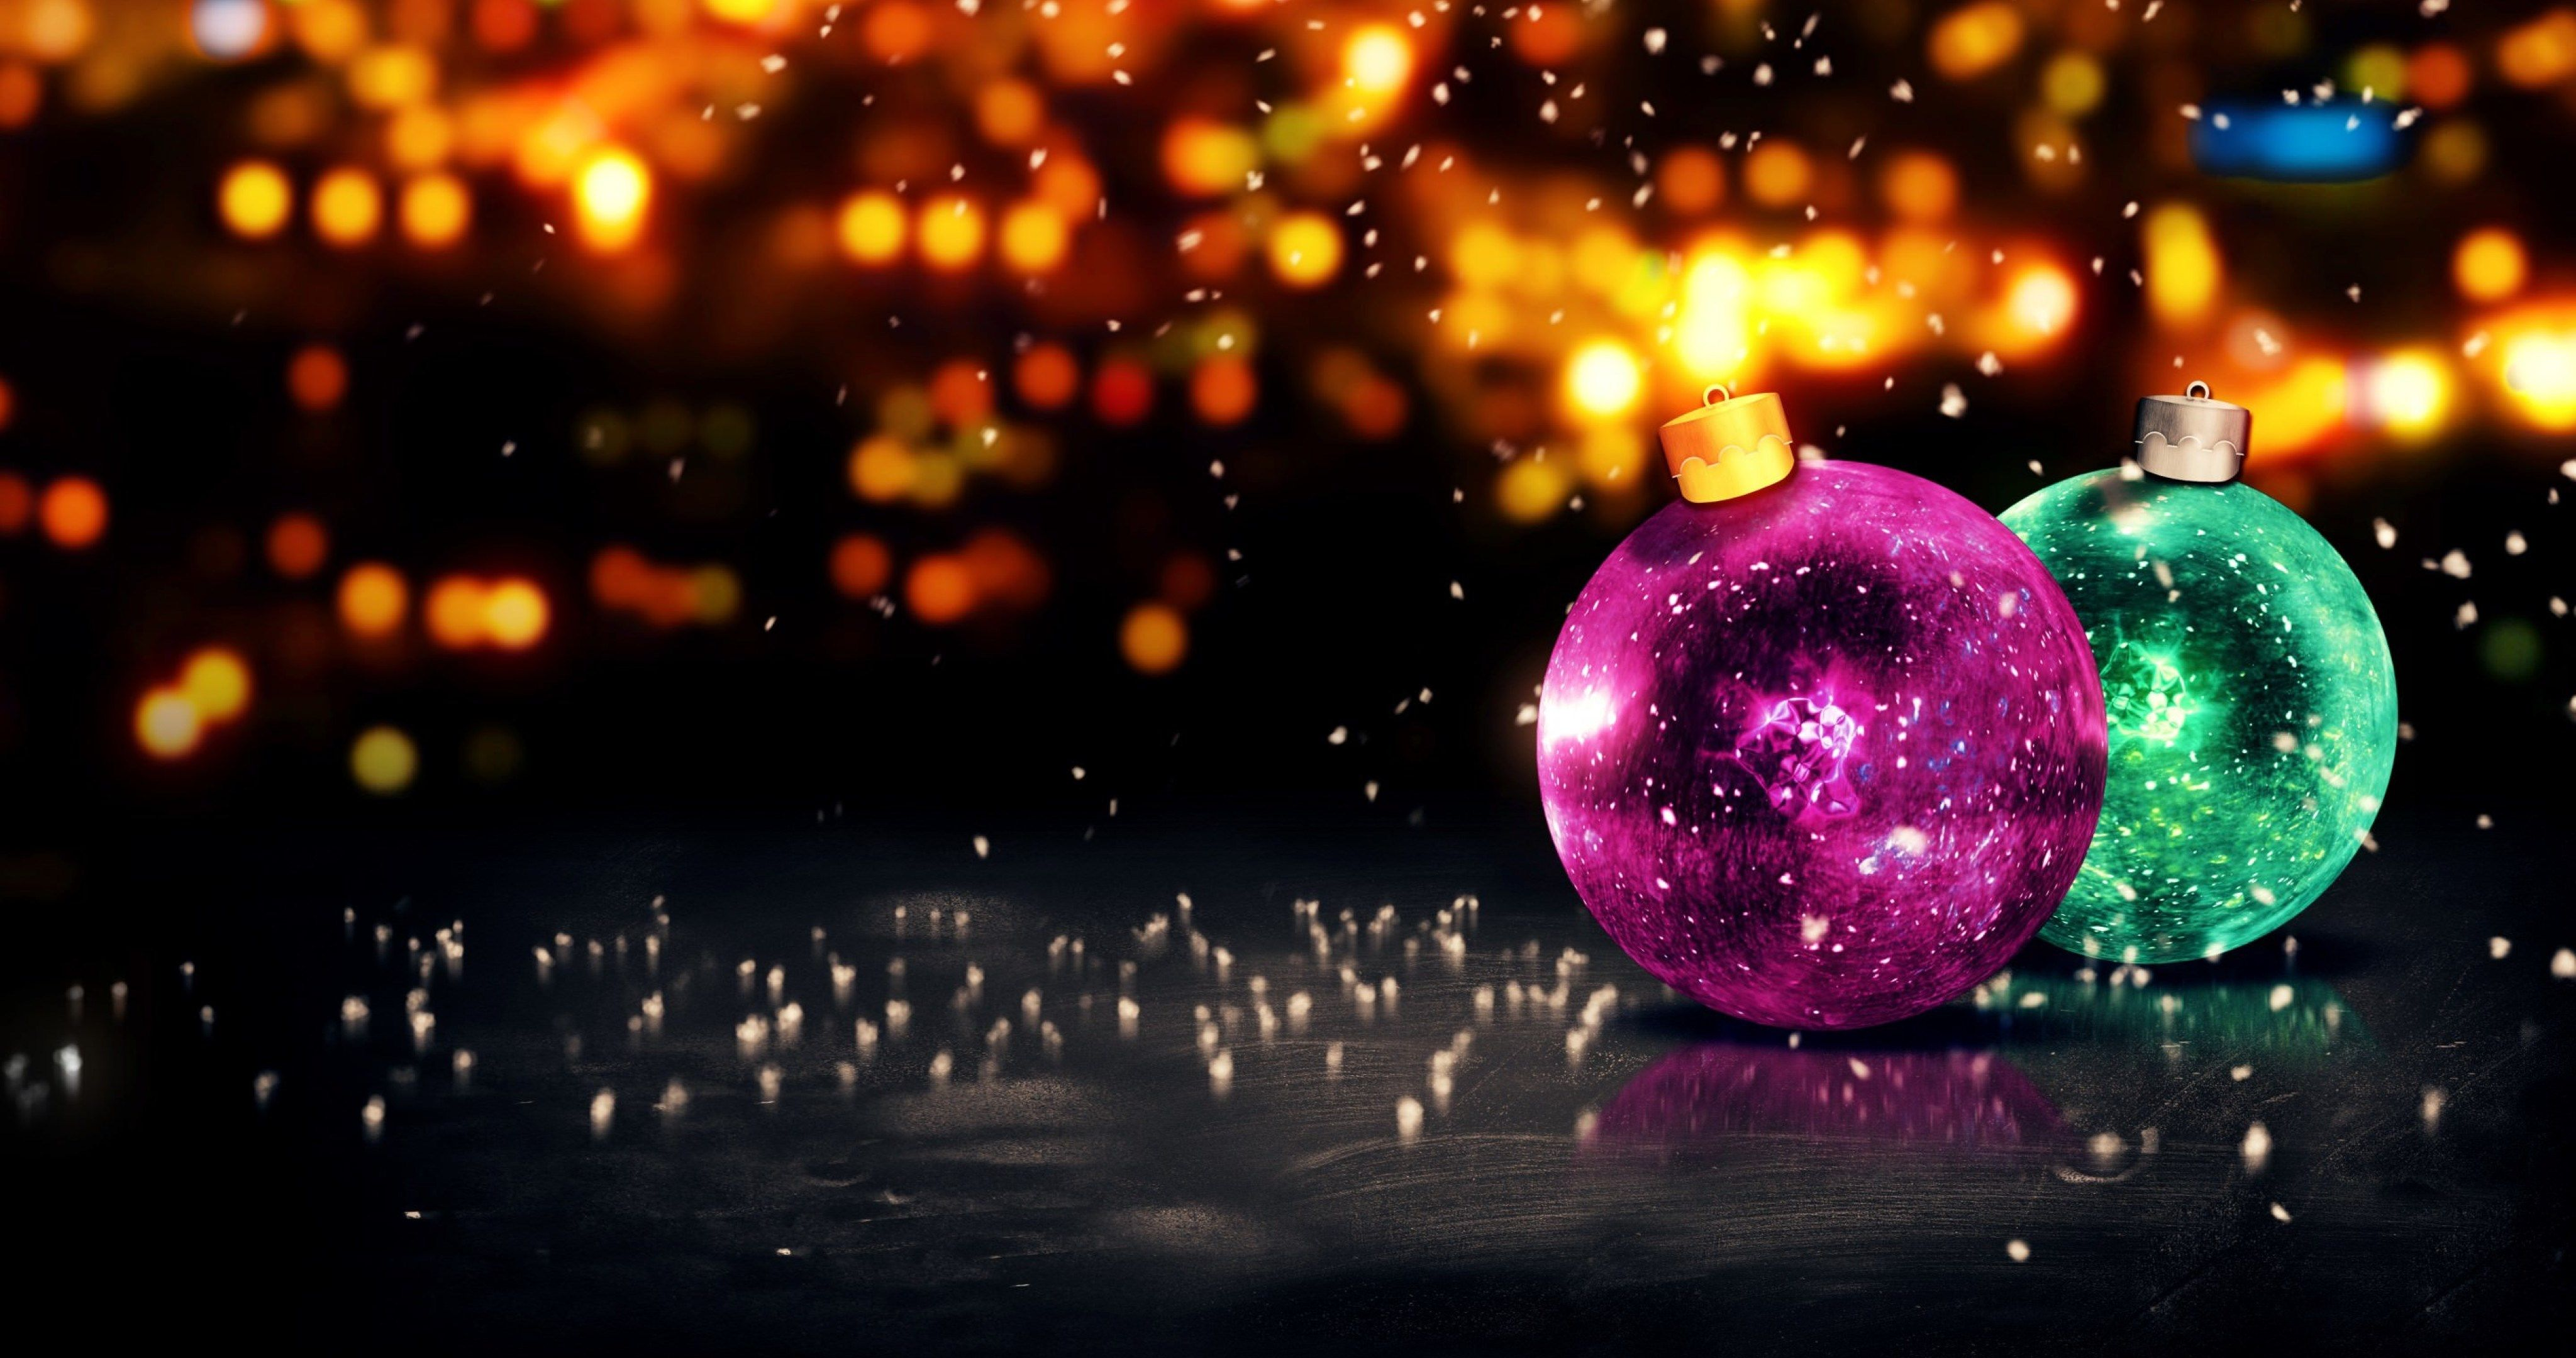 Árbol De Navidad Ilustración 2015 Ultra Hd Wallpapers: Merry Christmas Balls Wallpaper 4k Ultra Hd Wallpaper